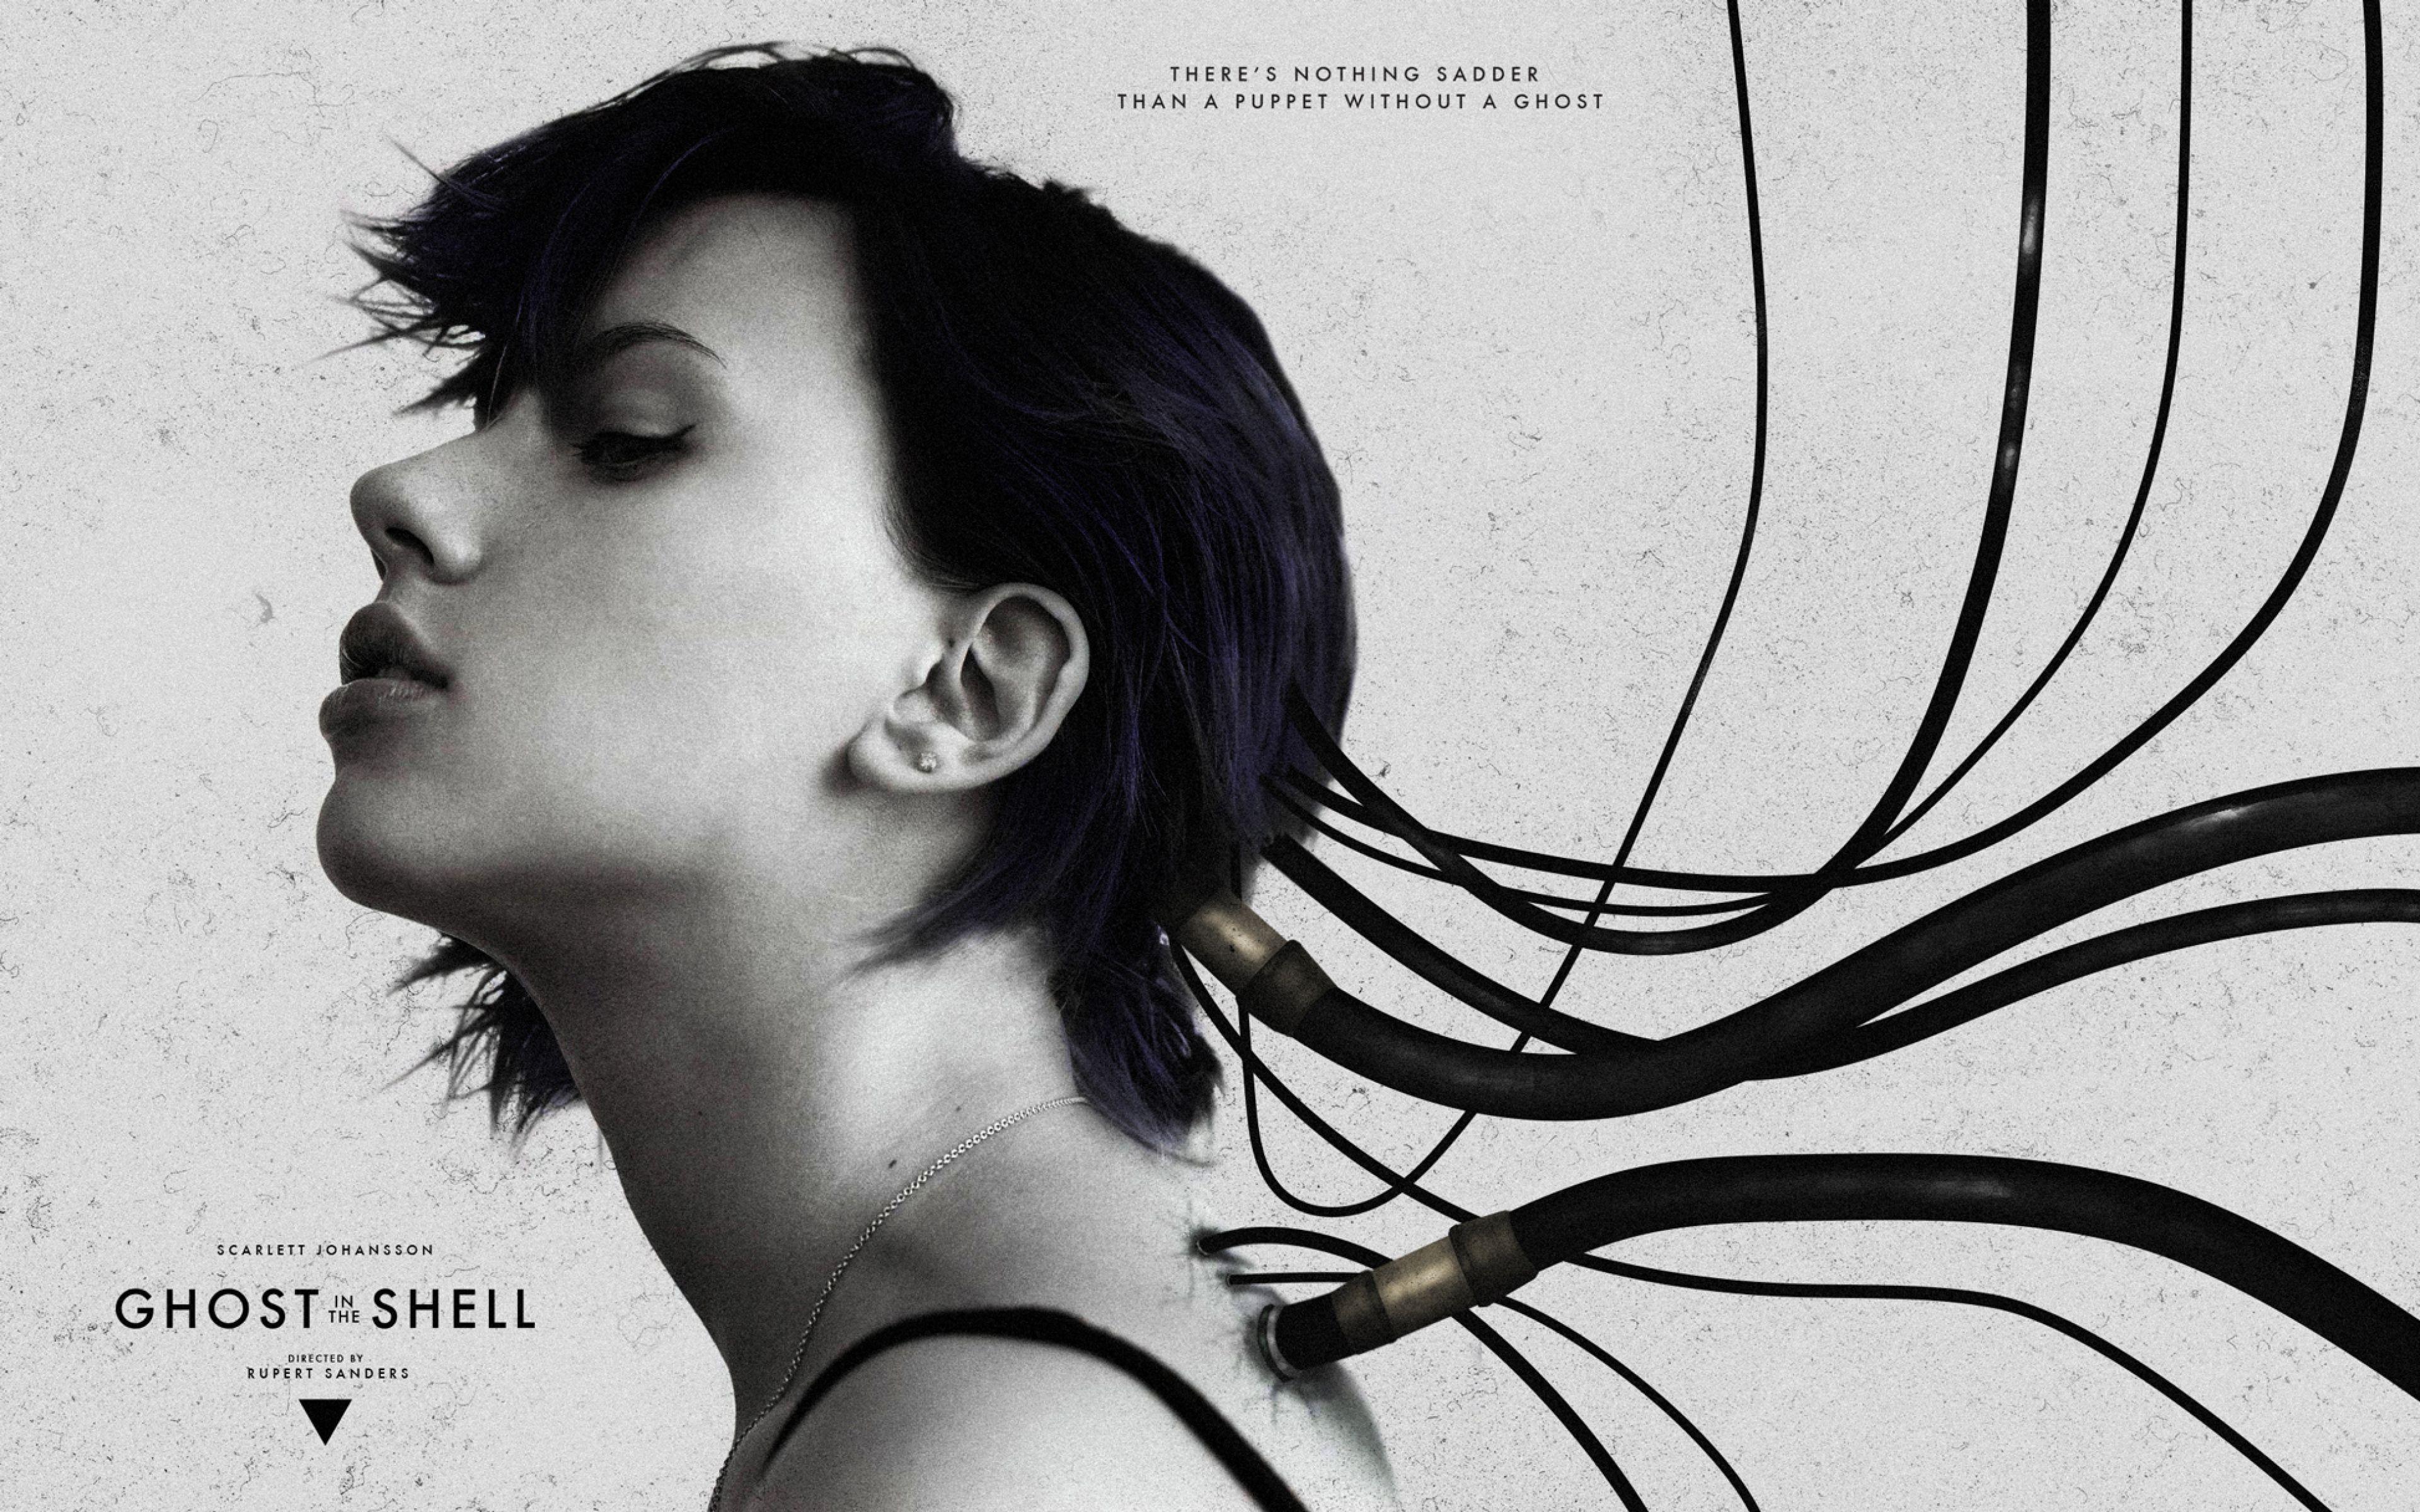 Download Wallpaper 3840x2400 Ghost In The Shell, Scarlett